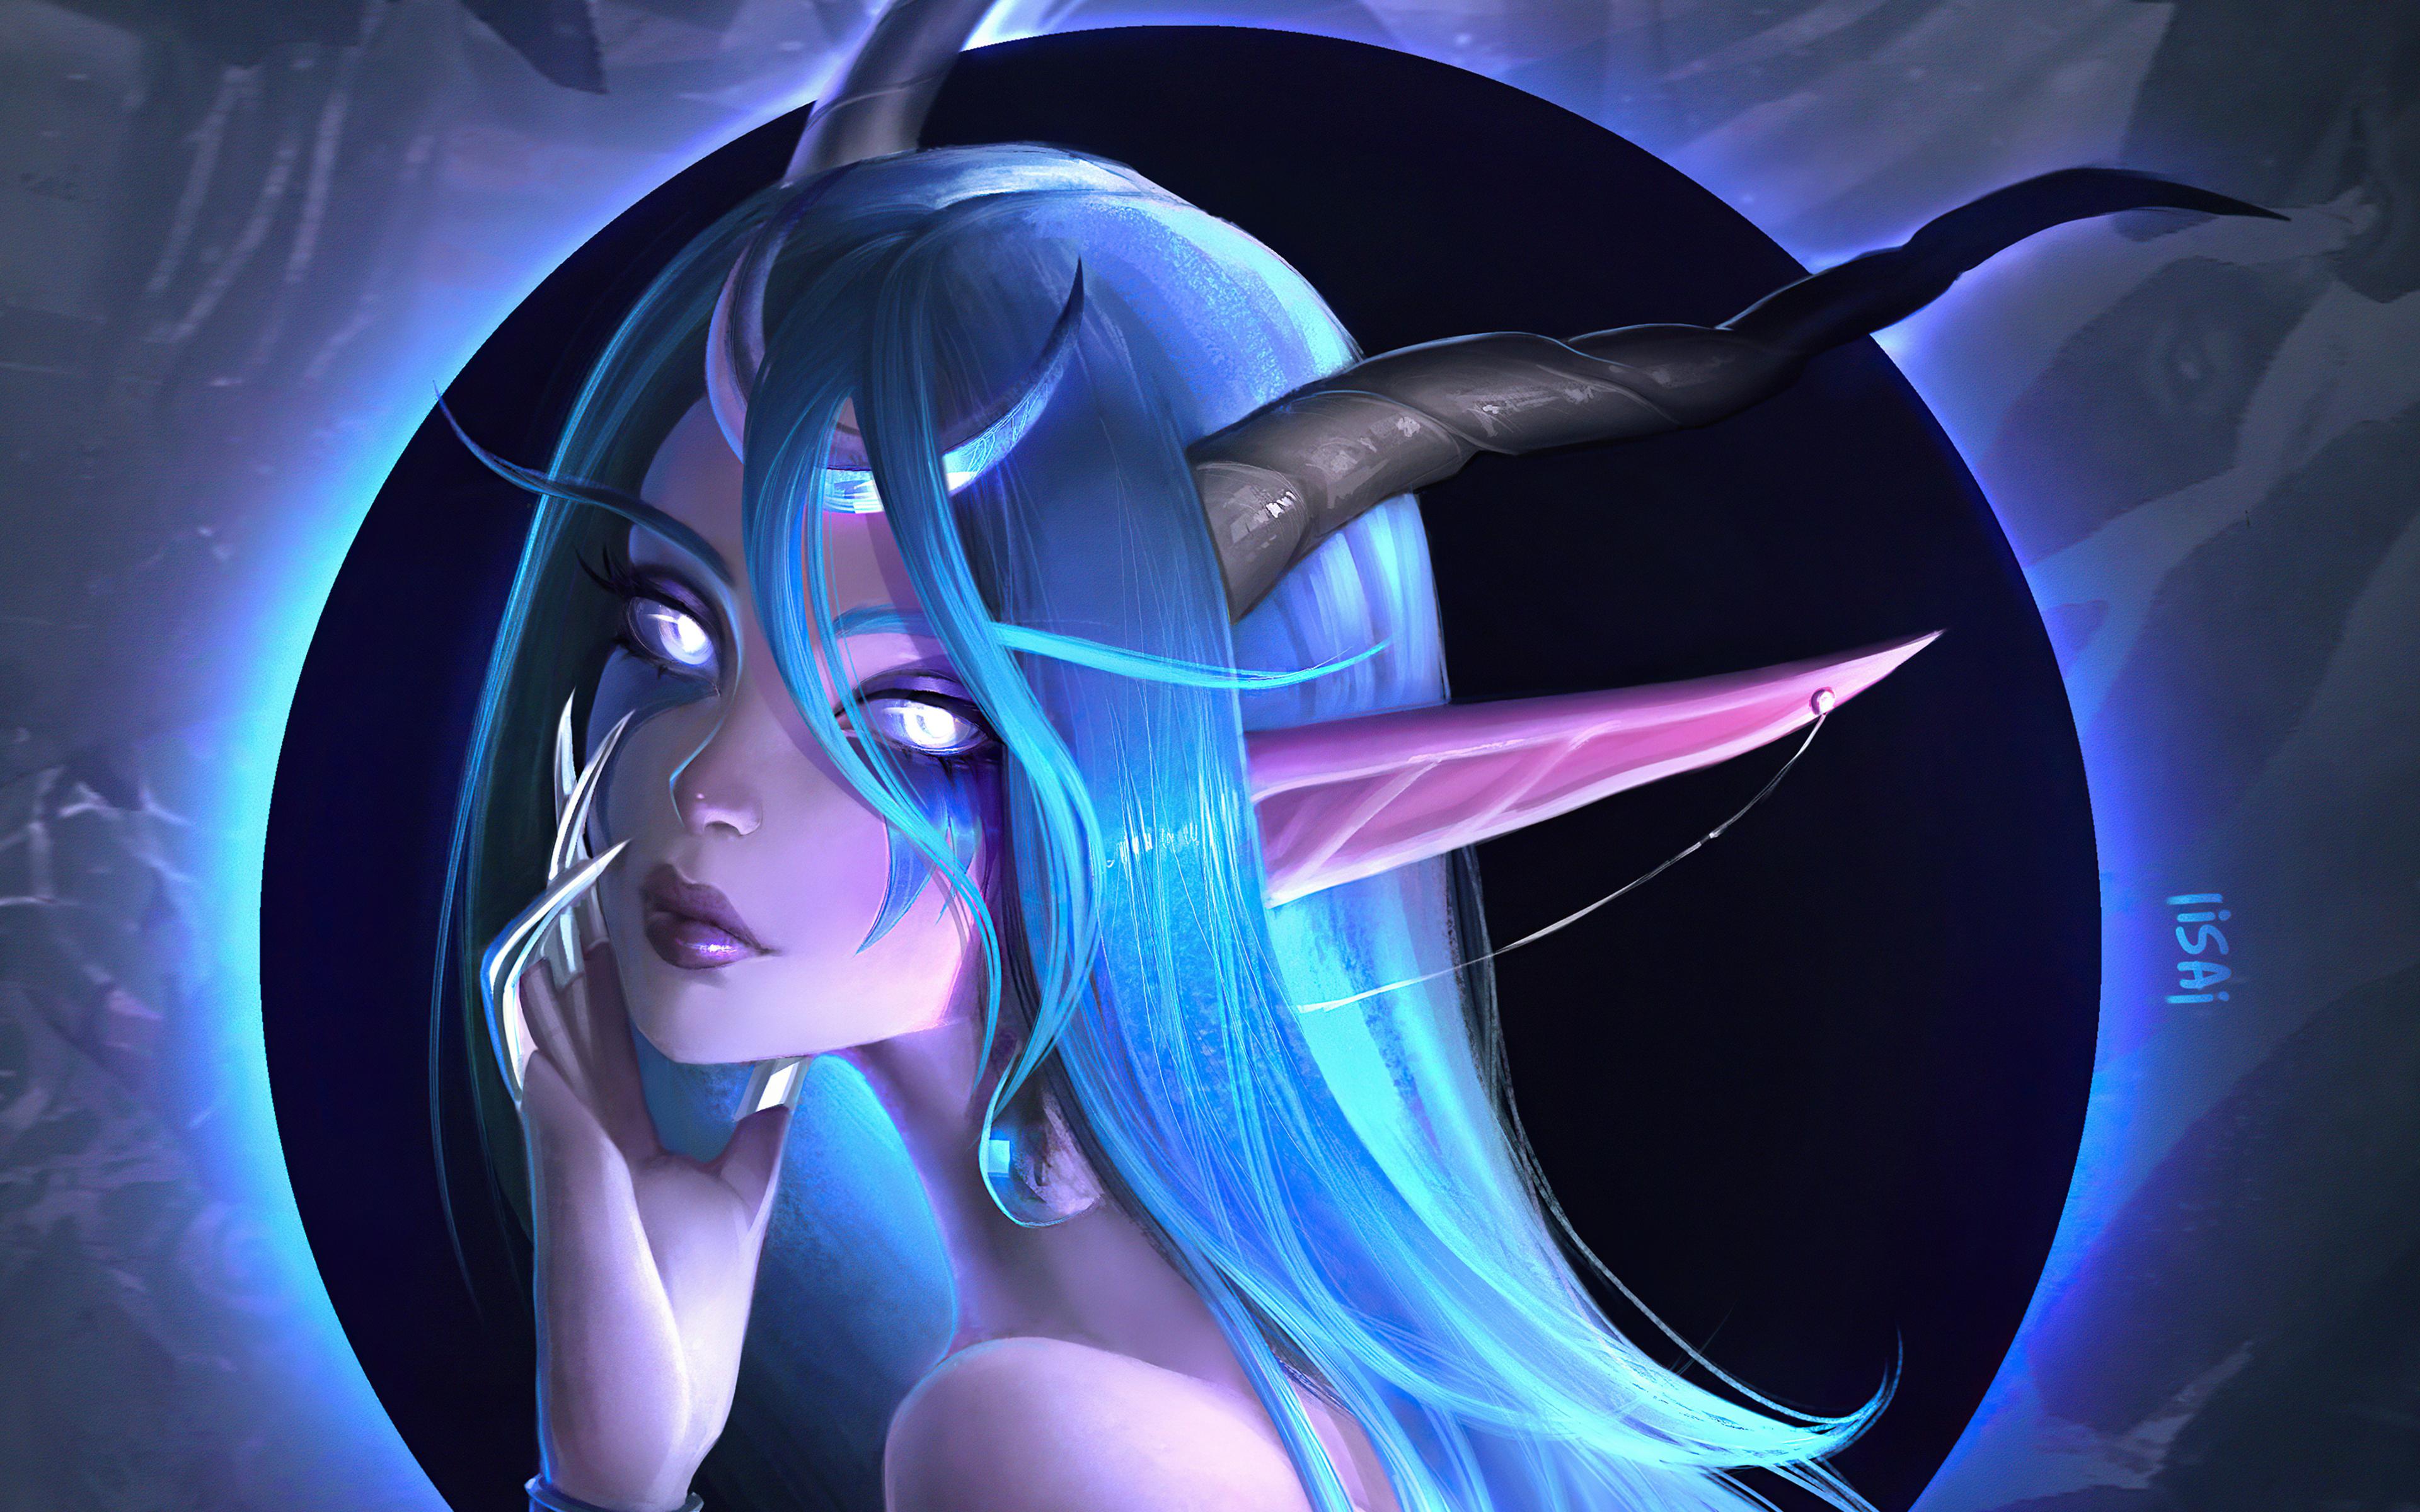 ysera-elf-women-fantasy-4k-5n.jpg